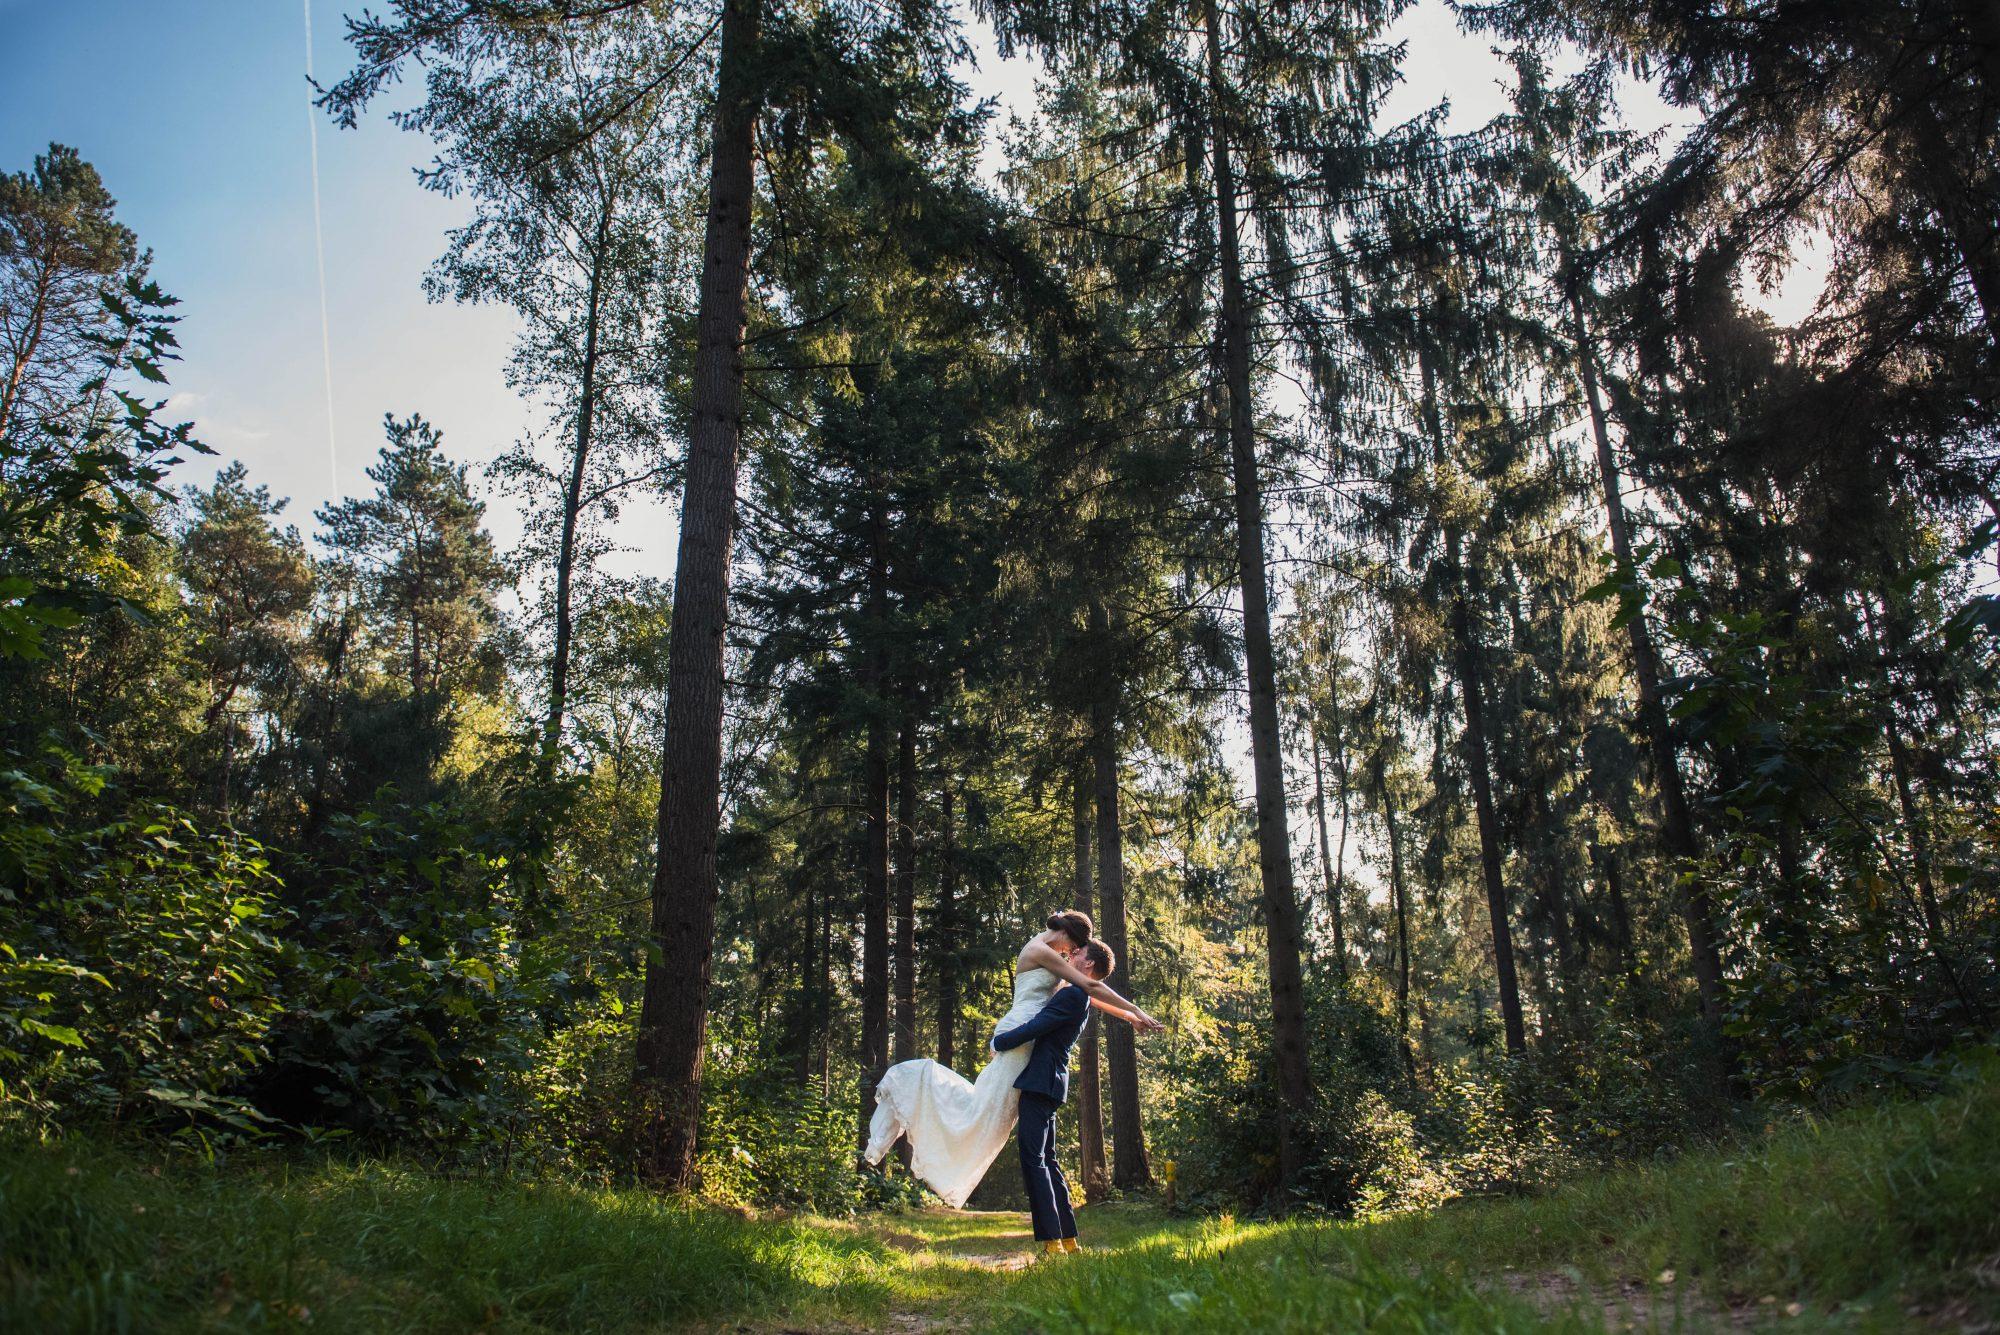 bruiloft-roland-annewil-203